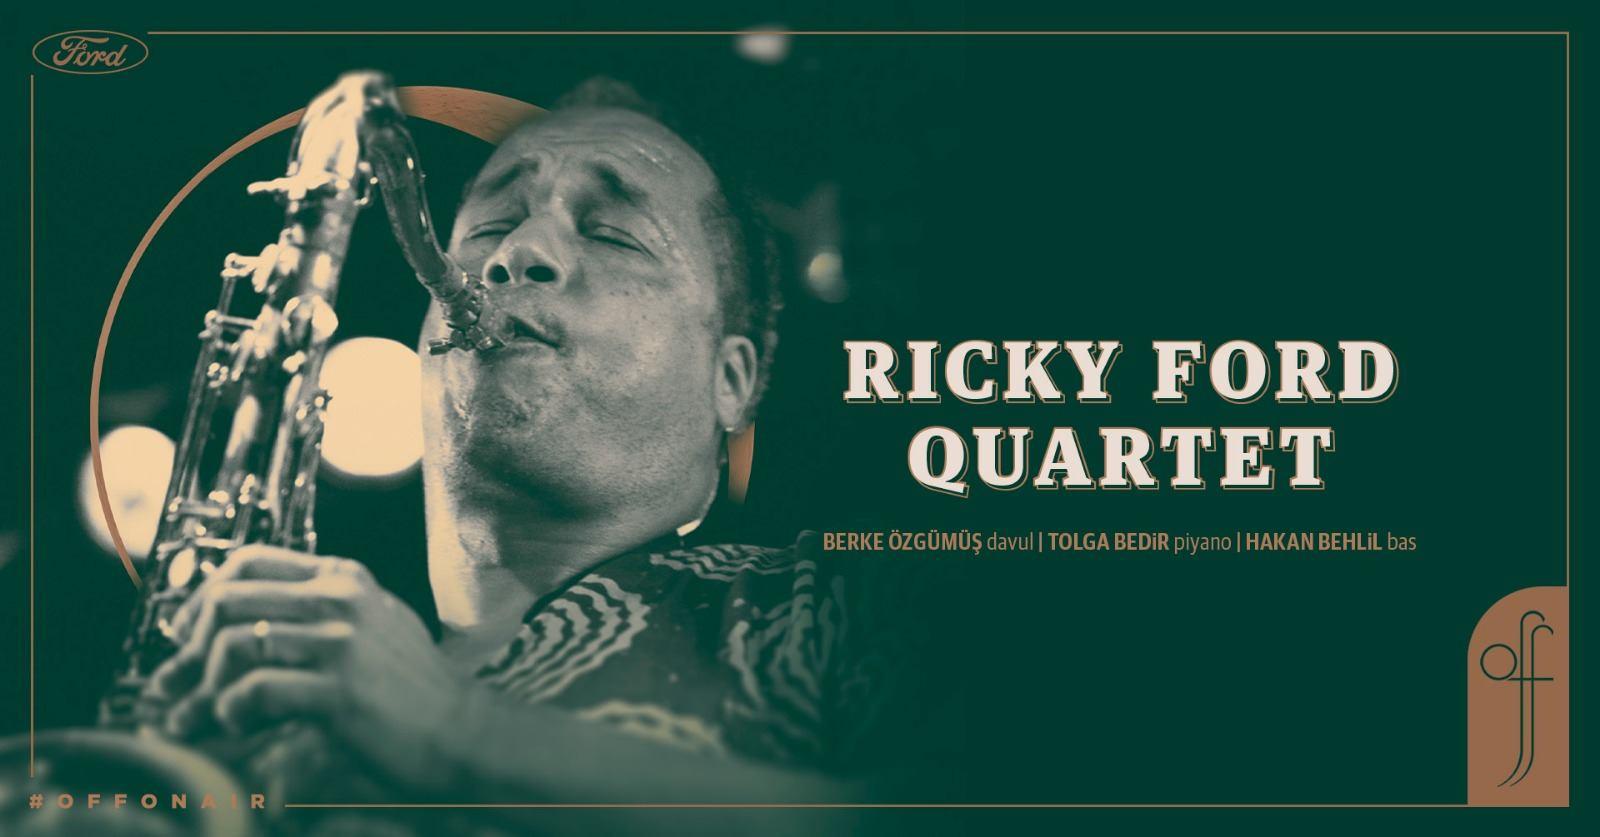 Ricky Ford Quartet